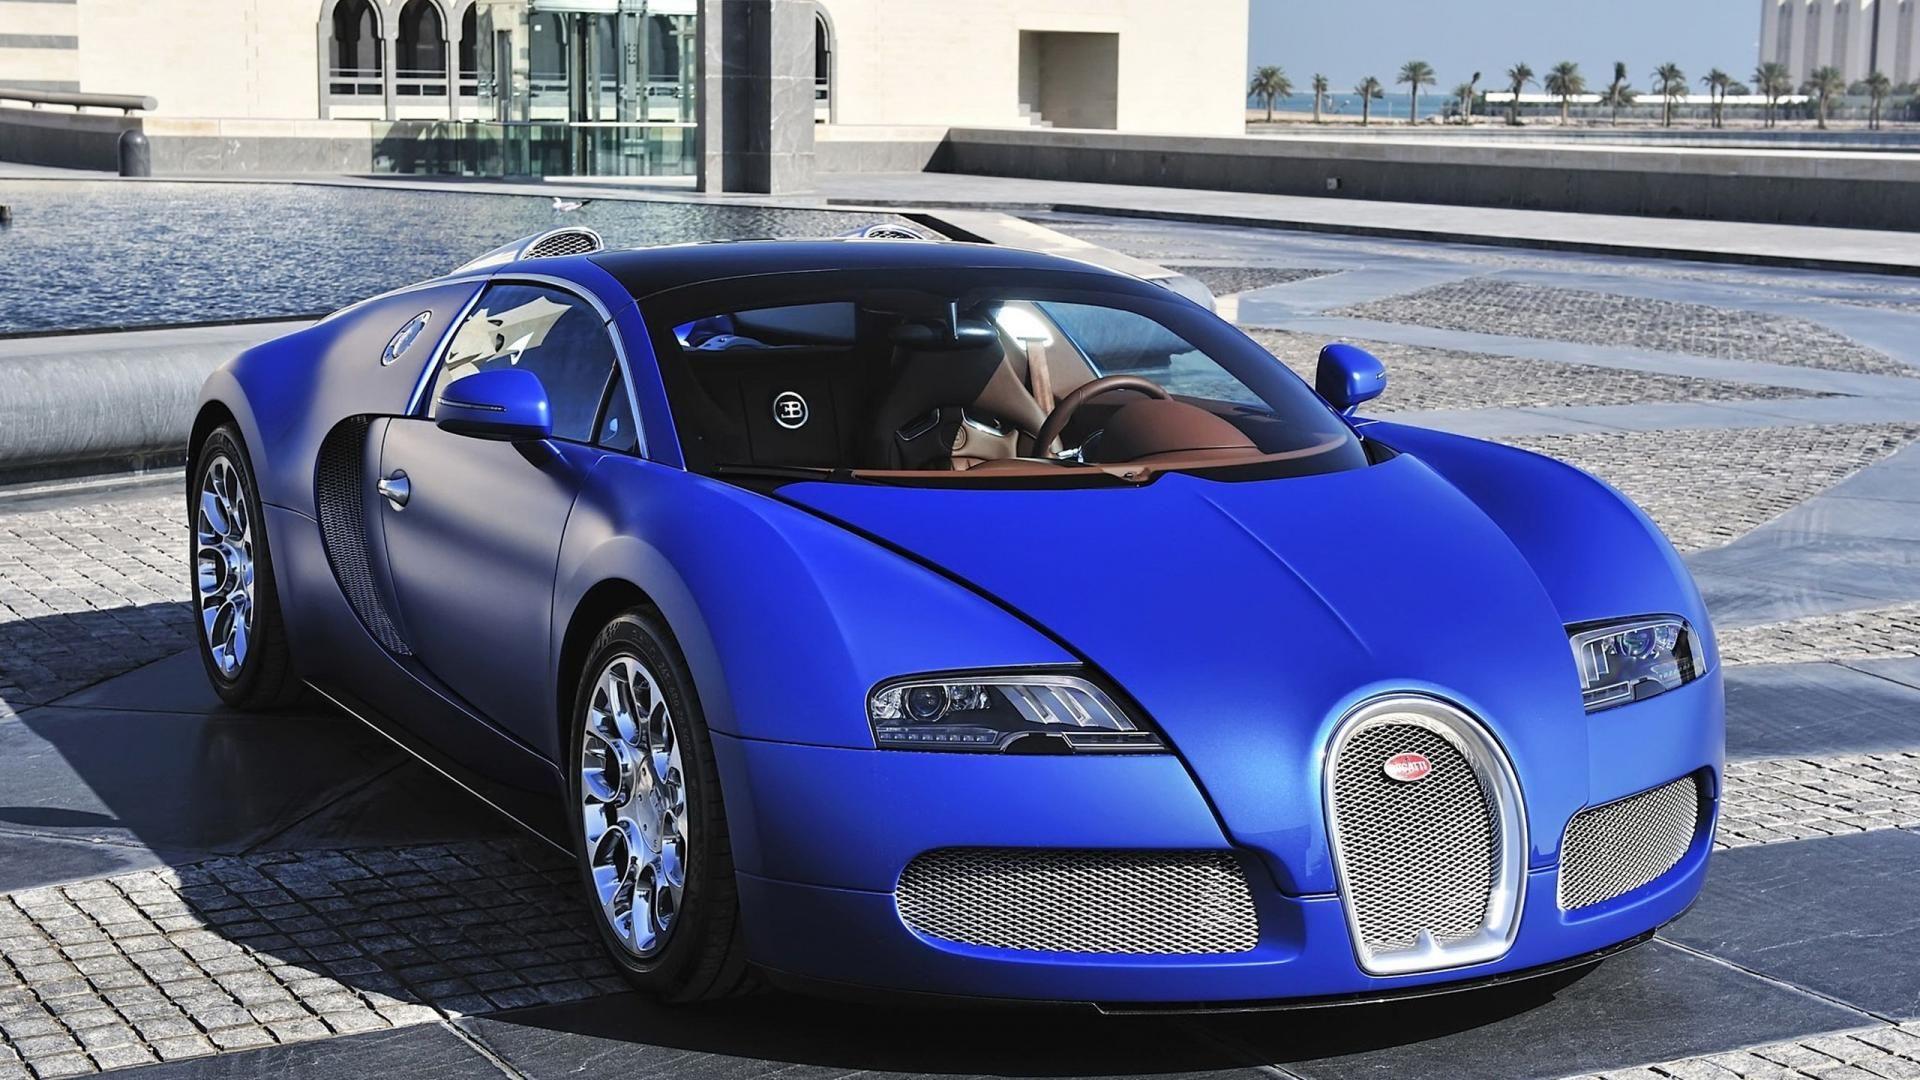 Blue Bugatti Veyron: Car AncestryBugatti Veyron Grand Sport